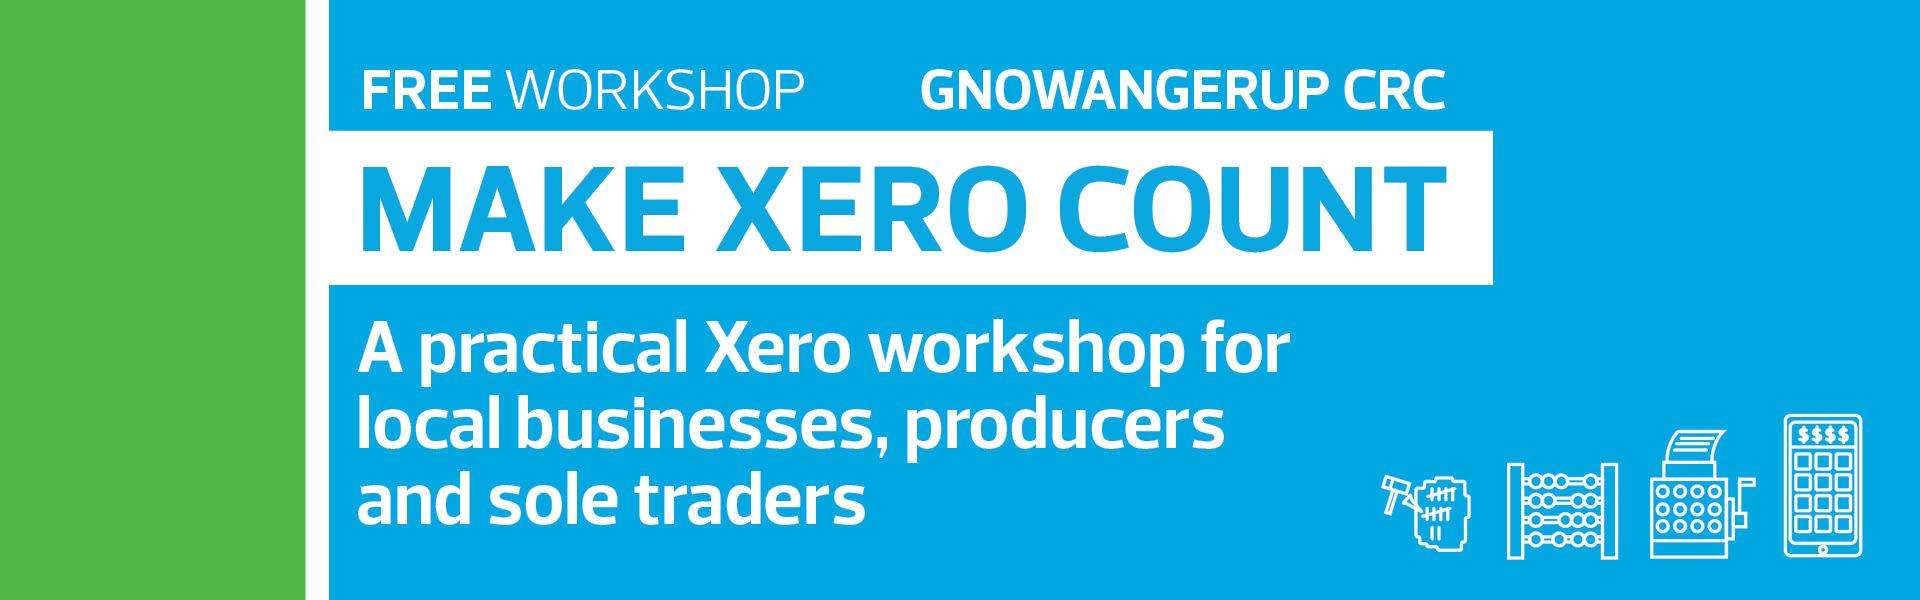 Make Xero Count